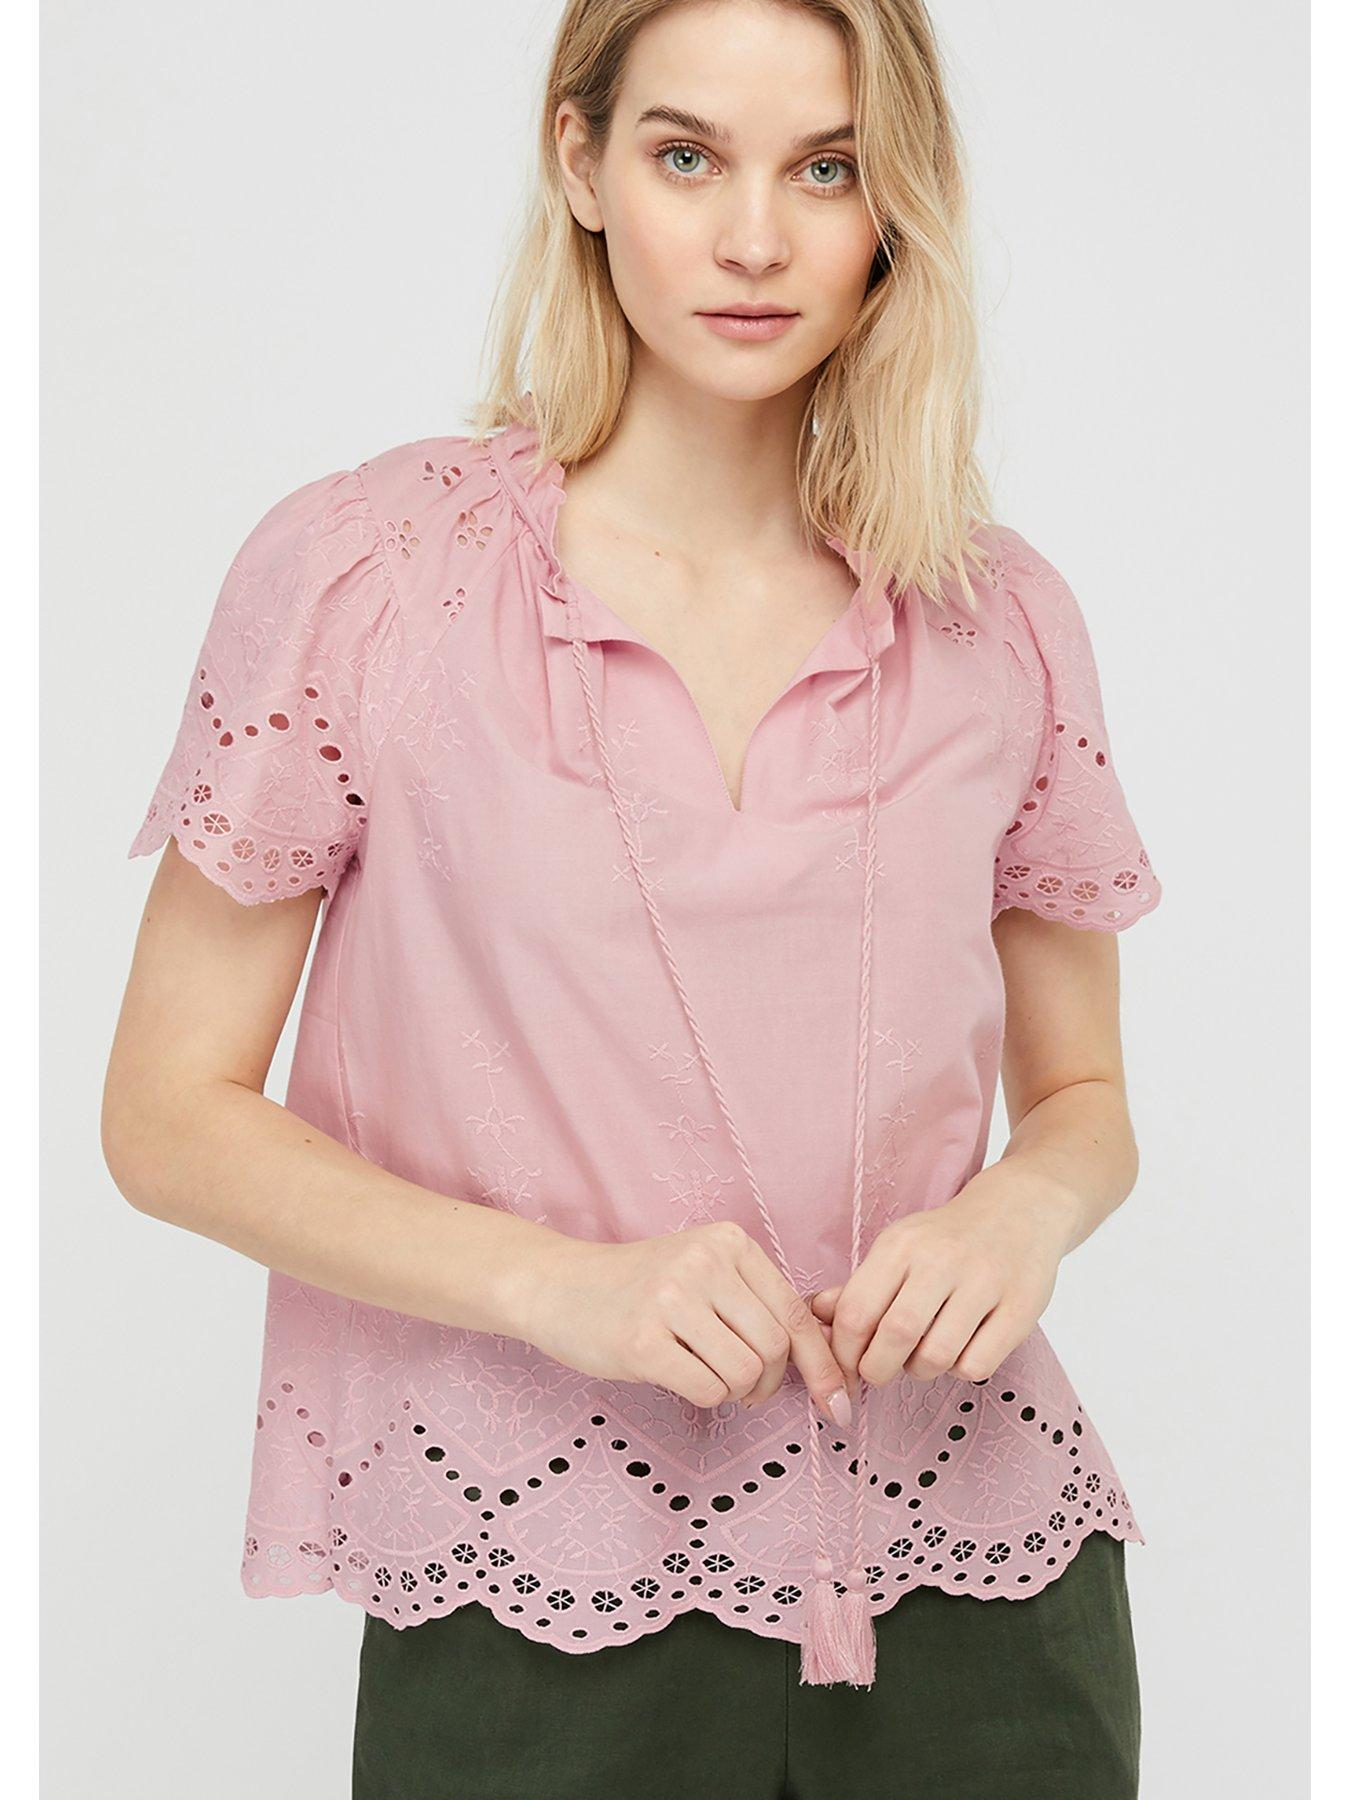 Short Sleeve t-Shirt Pink Puzzle T Shirt Puzzle Piece Shirt Pink Shirt Puzzle Top Puzzle T Shirt